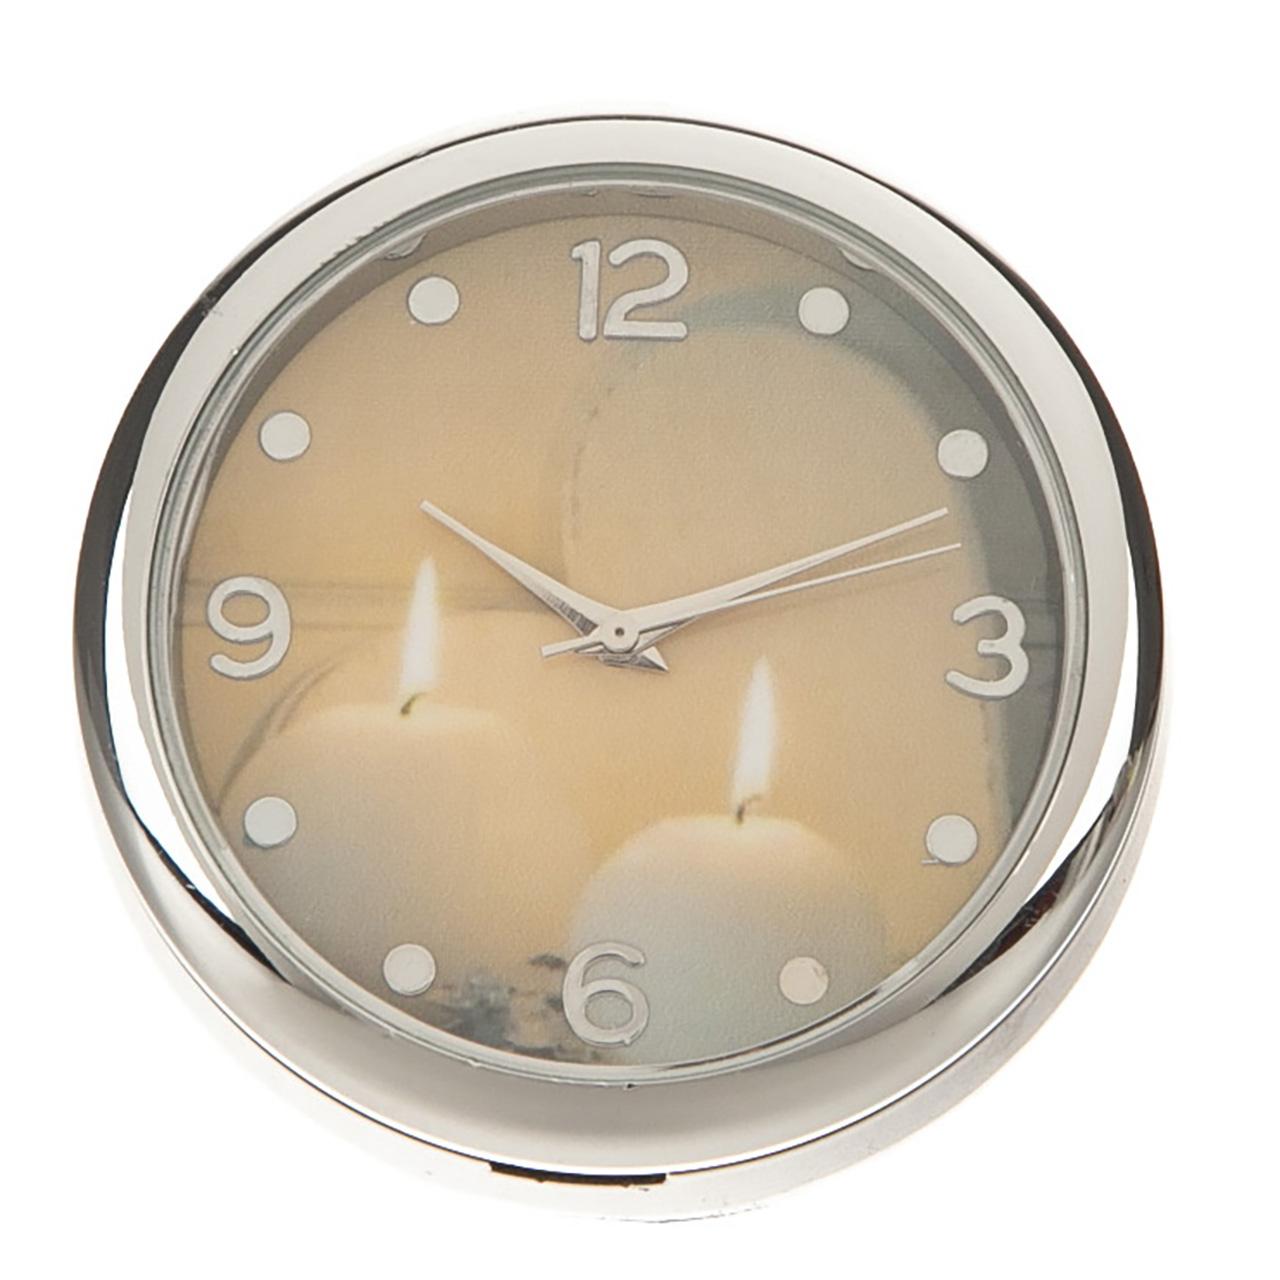 ساعت رومیزی مدل a23